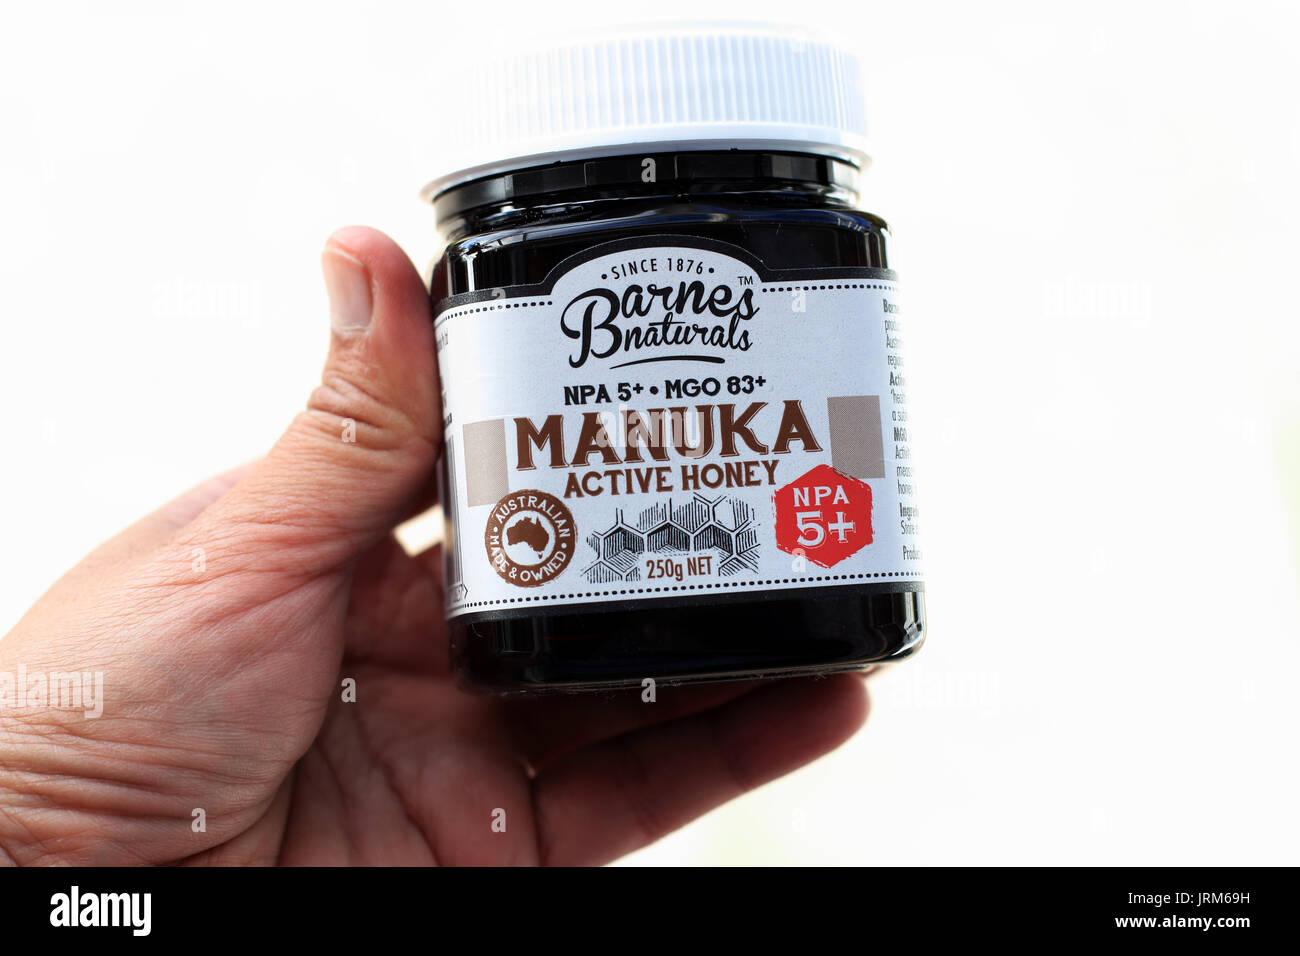 Barnes Naturals Australian Manuka Honey Immagini Stock